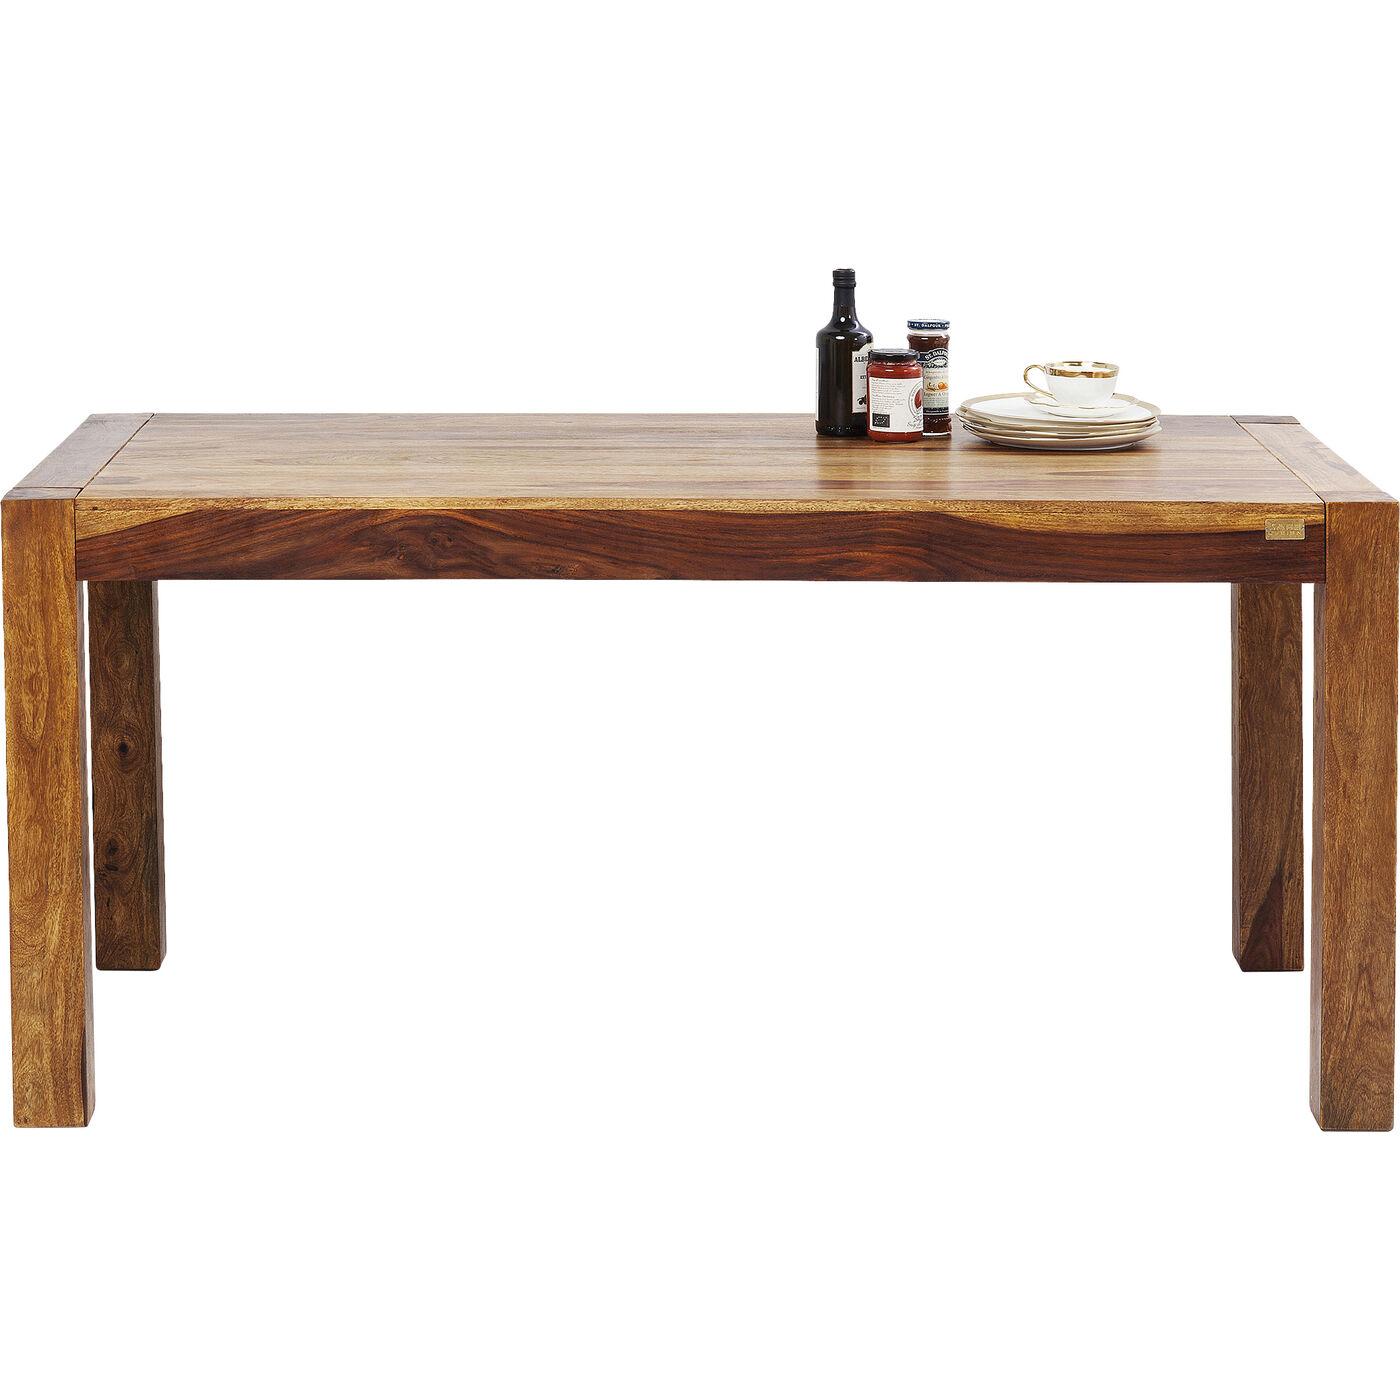 Authentico Tisch 180x90cm